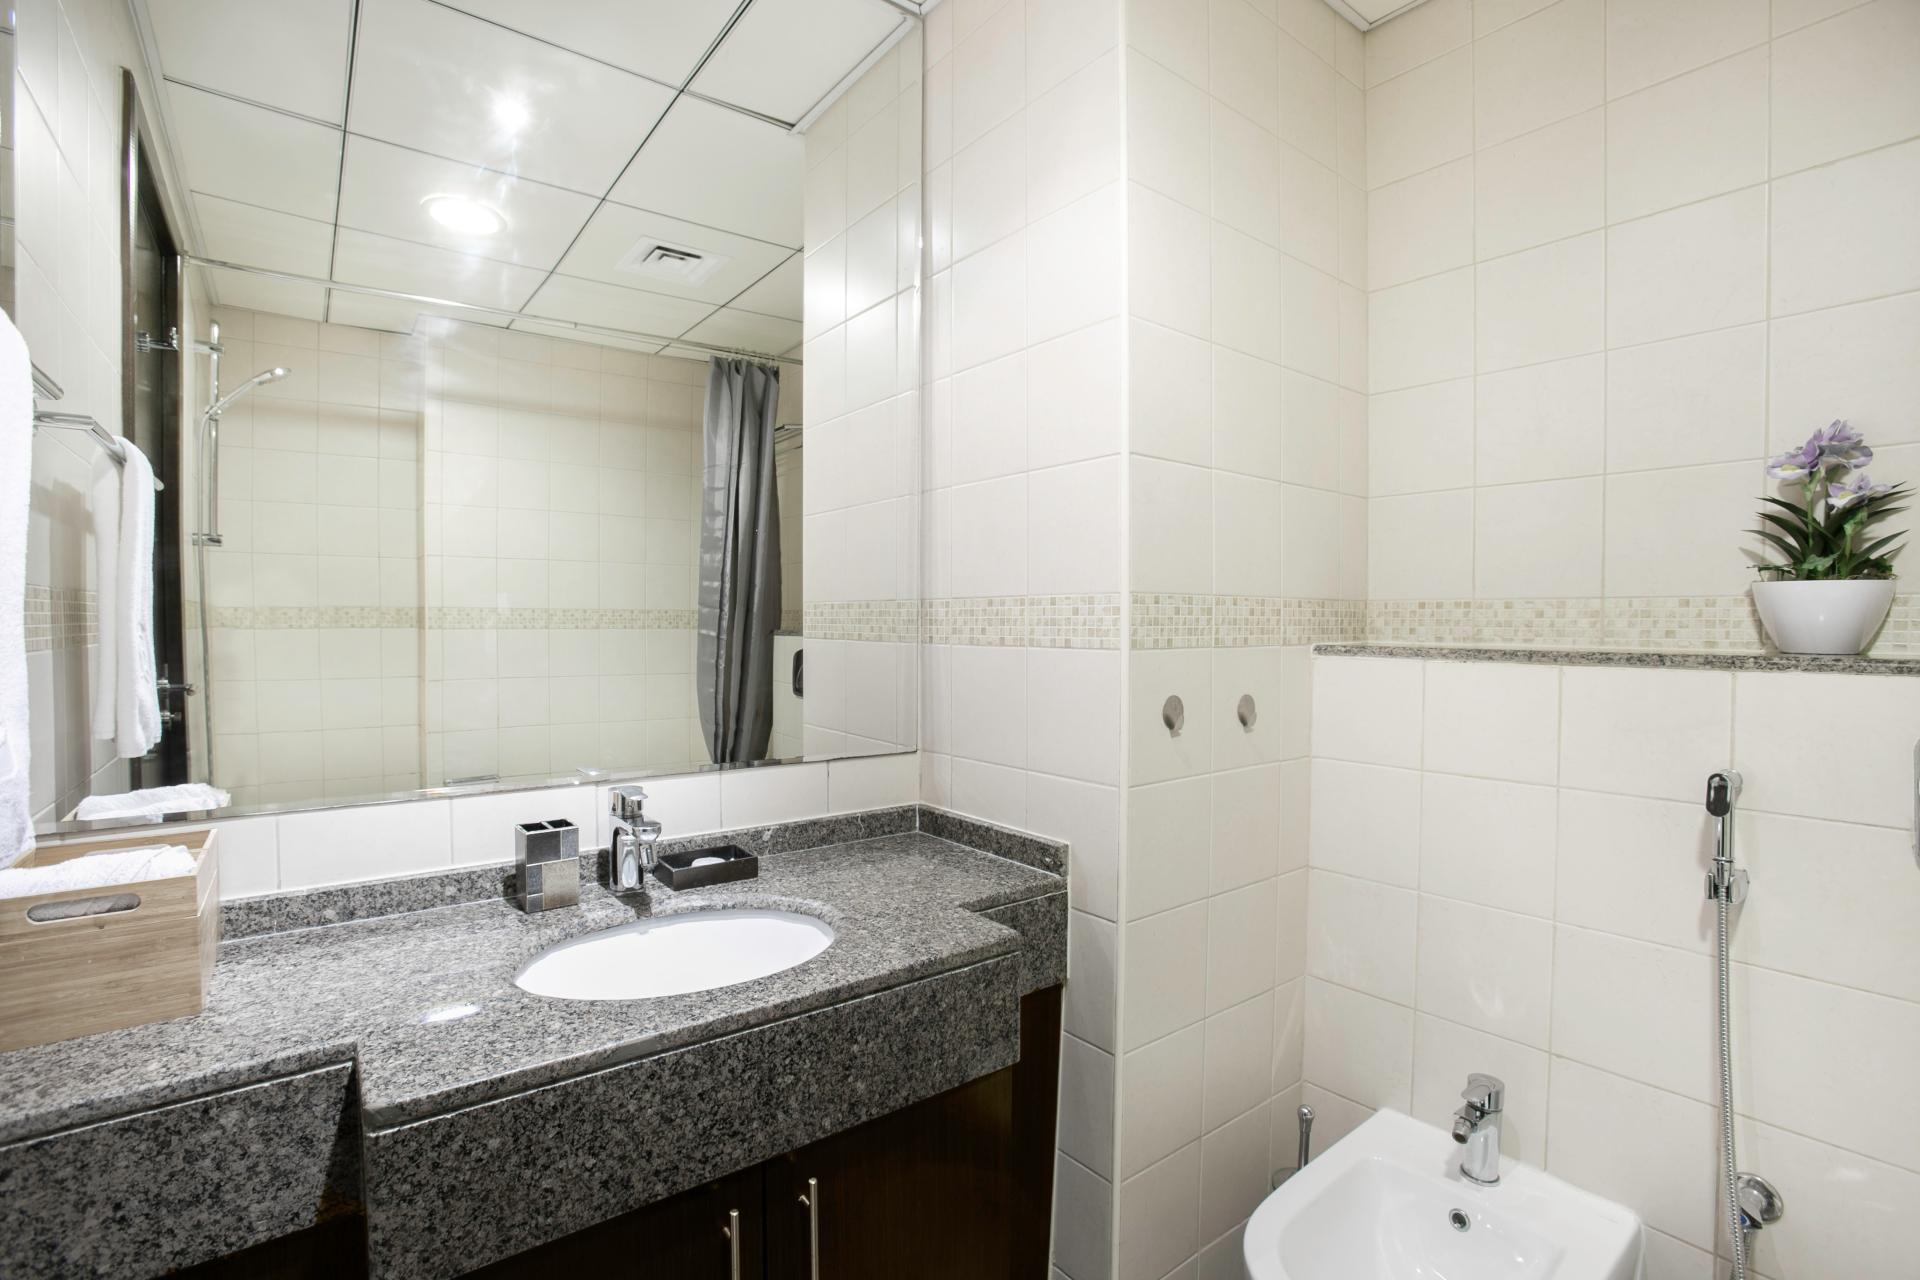 Bathroom vanity at Royal Oceanic Apartment